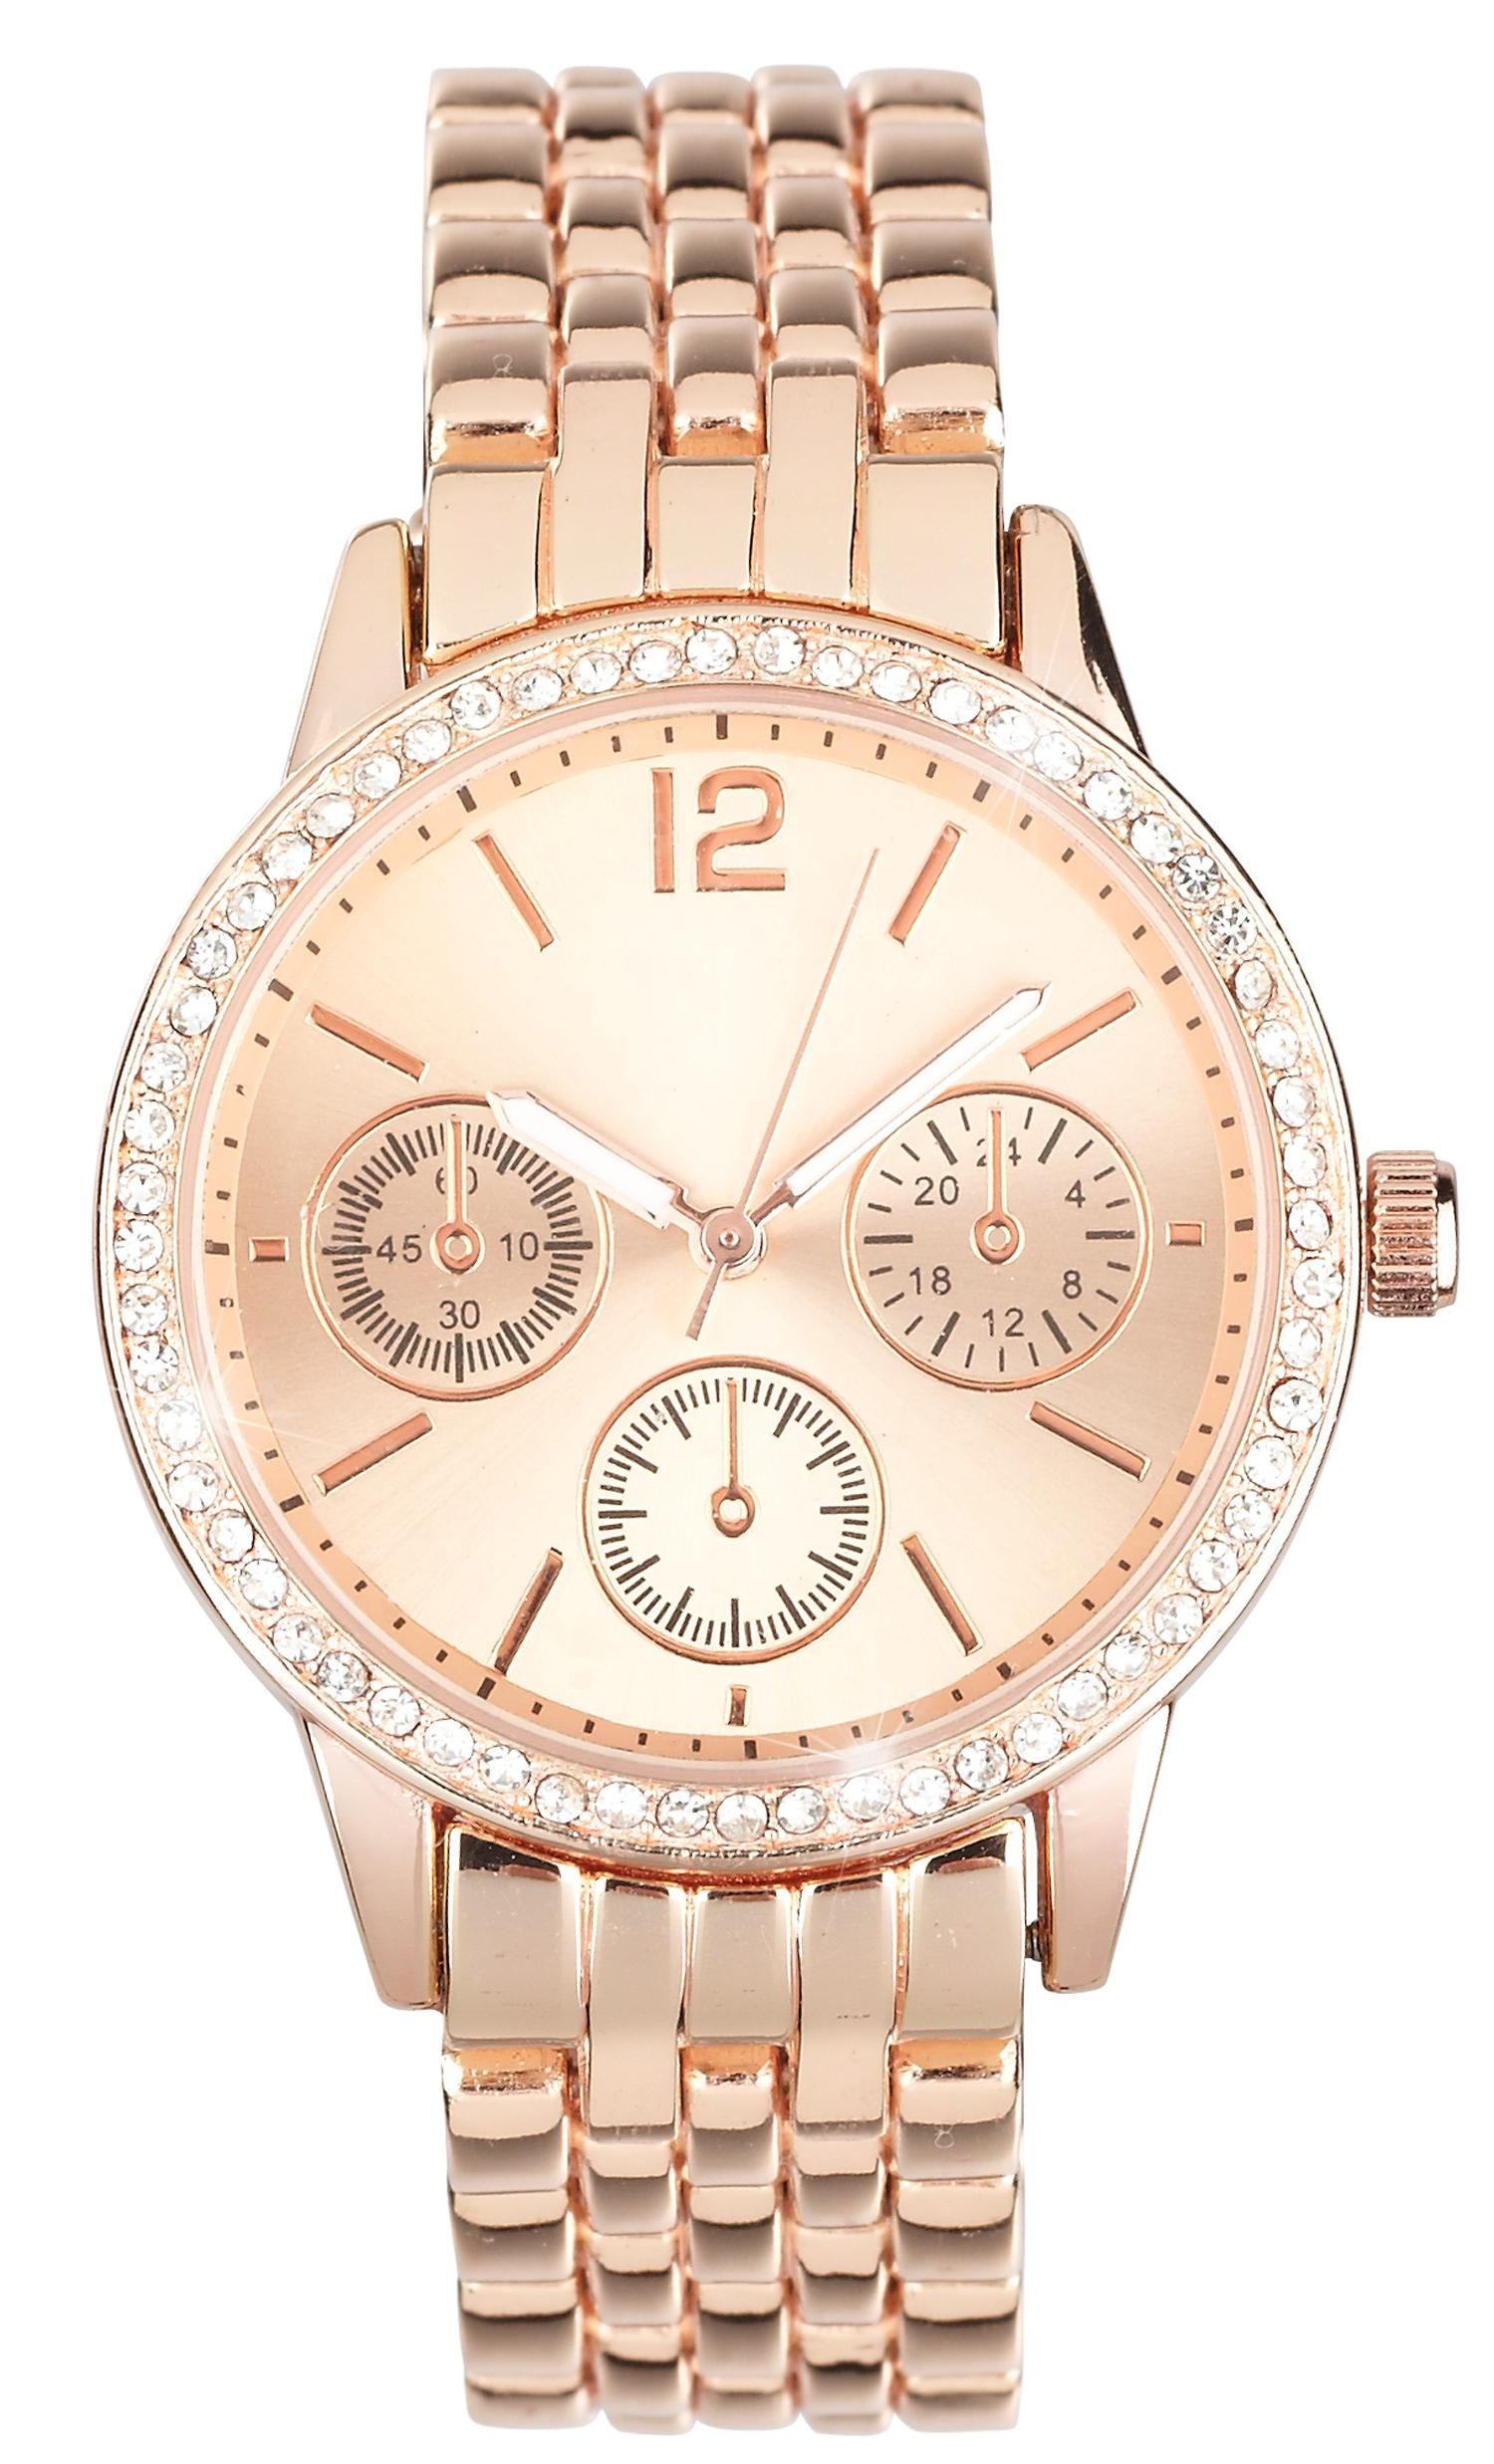 Assez Bijou Brigitte Watch - Rose Gold 30 euros | Accessories  QP88